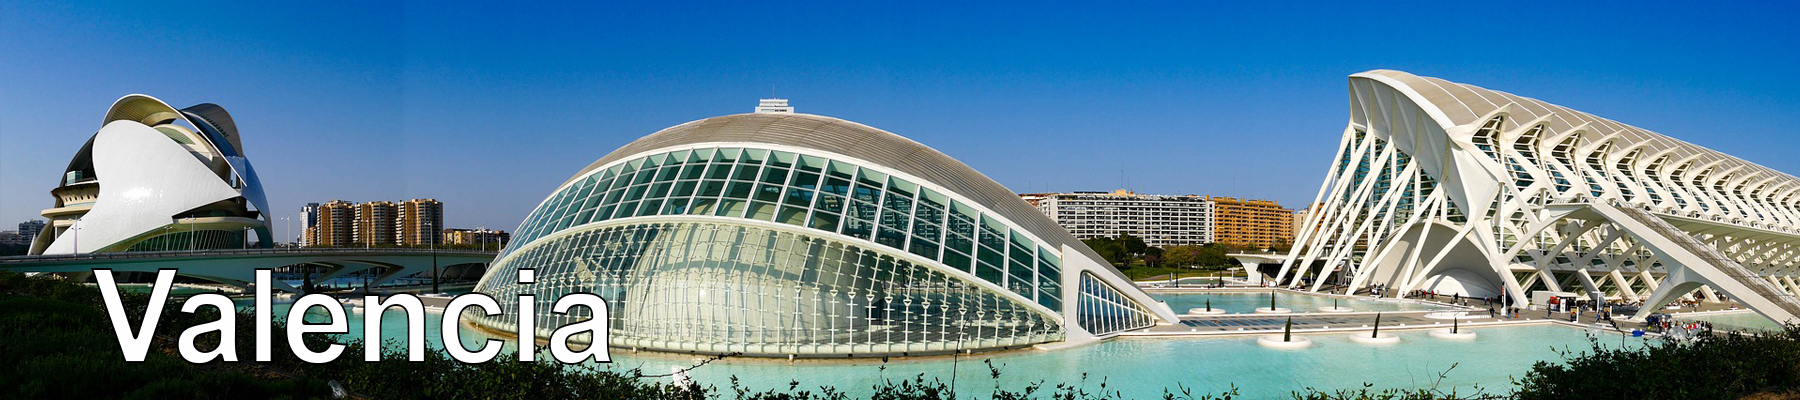 Valencia: Een verrassende metropool